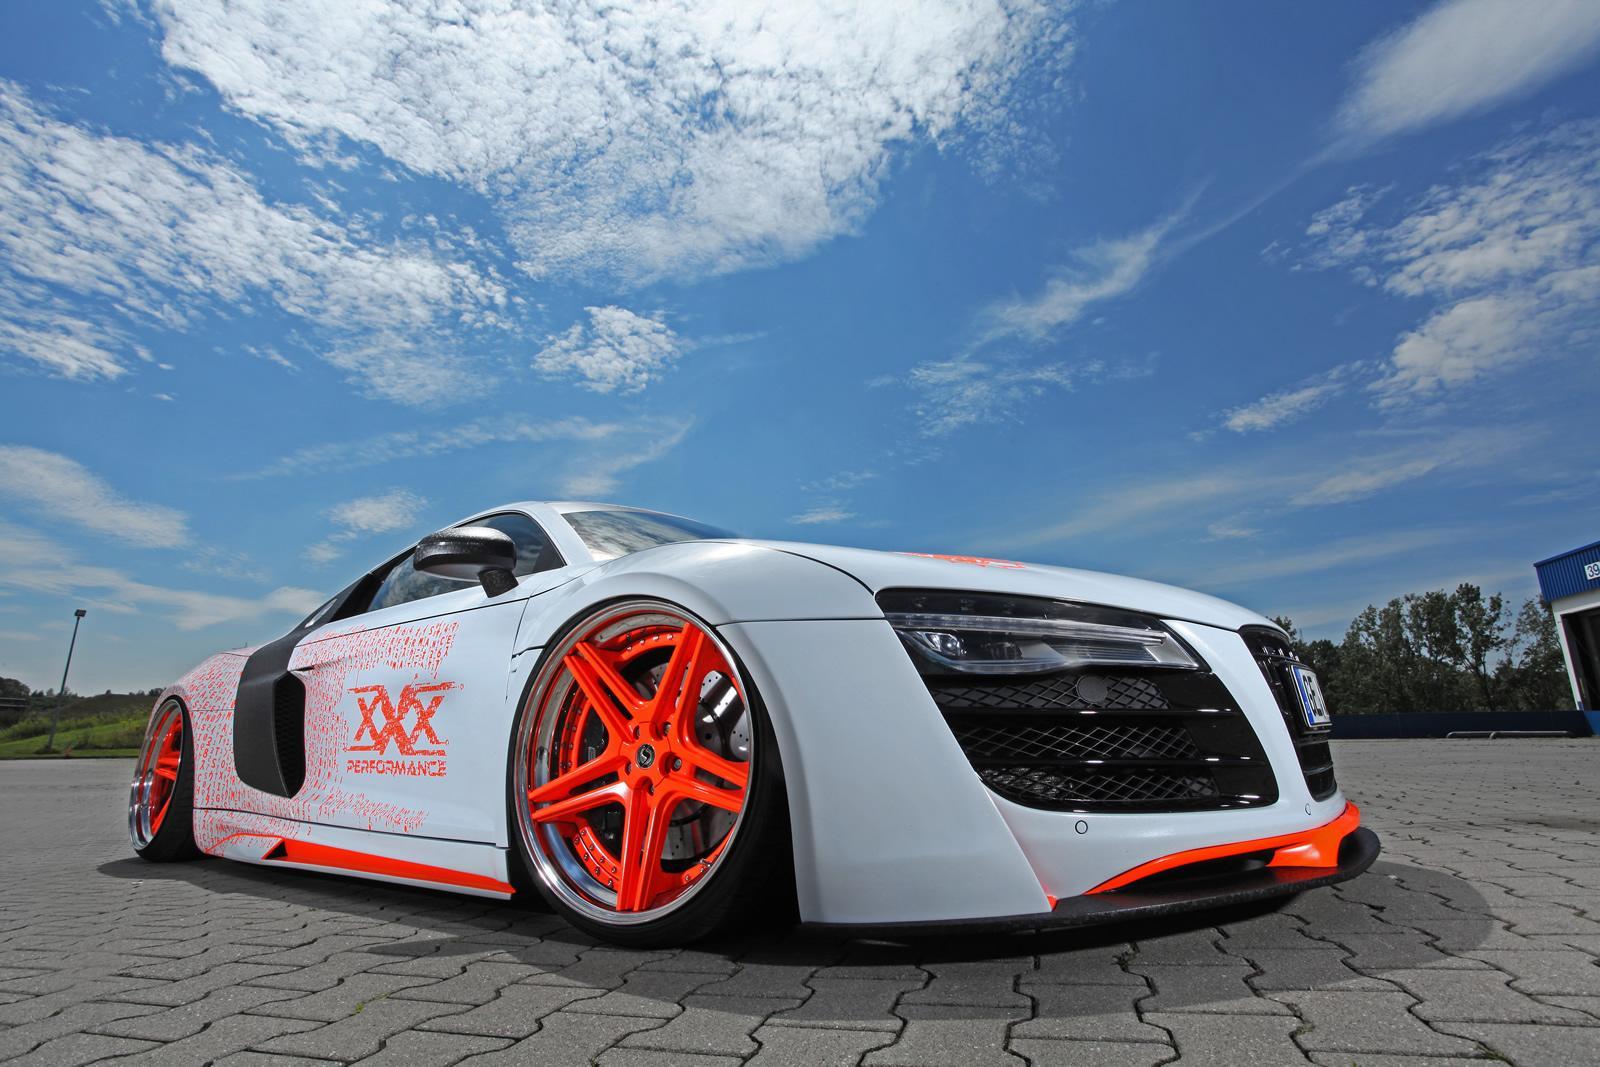 2014 Audi R8 Gets Killer Slammed Look from xXx Performance - autoevolution